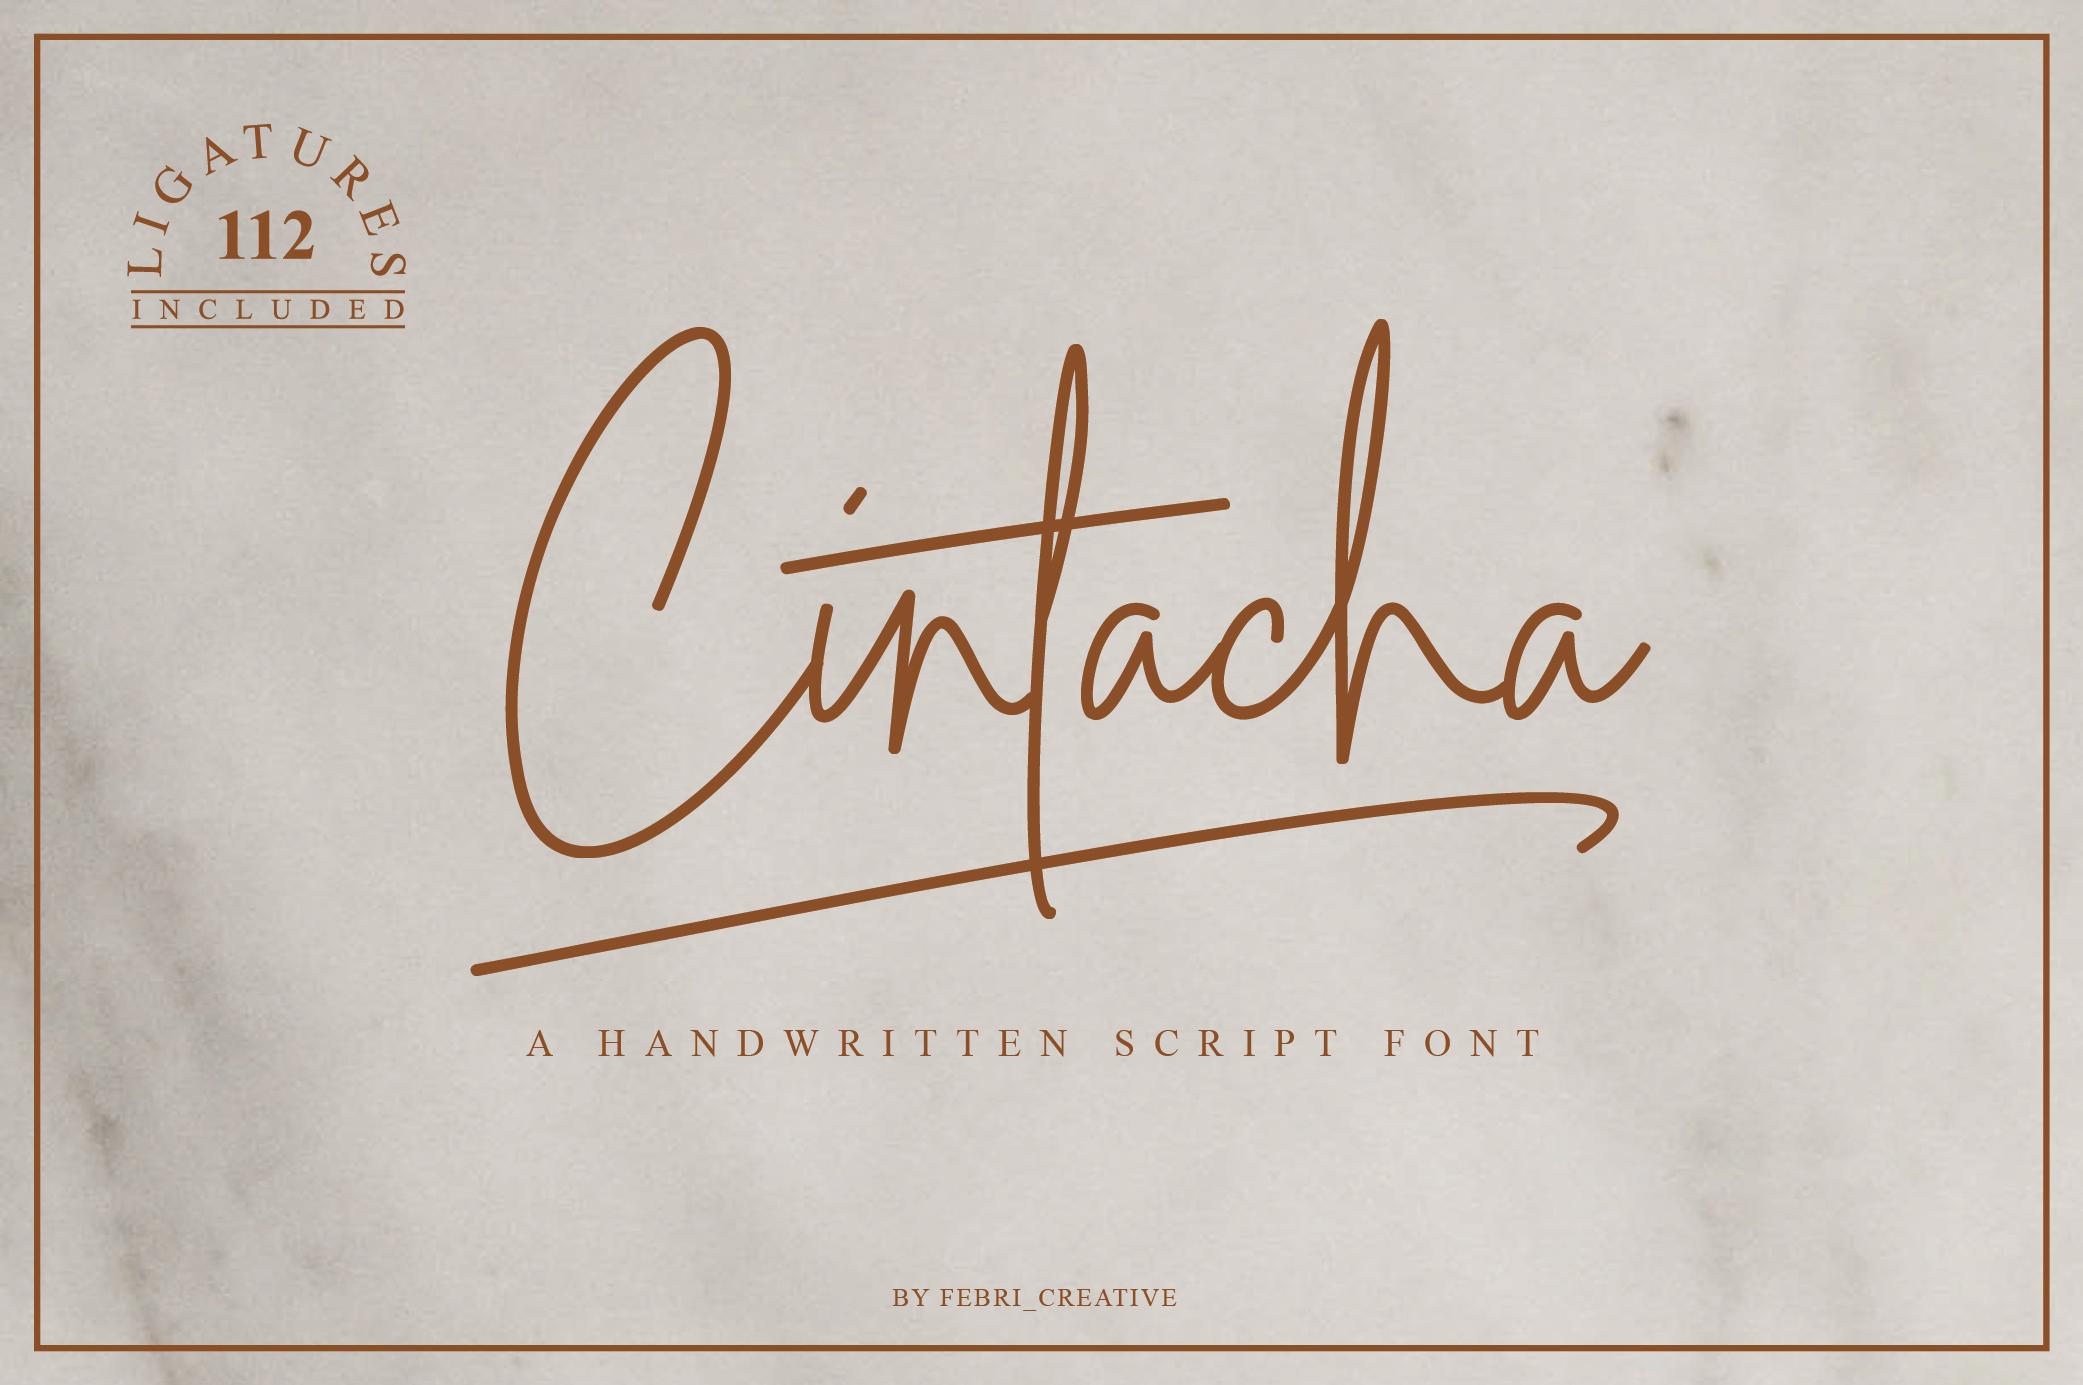 Cintacha example image 1